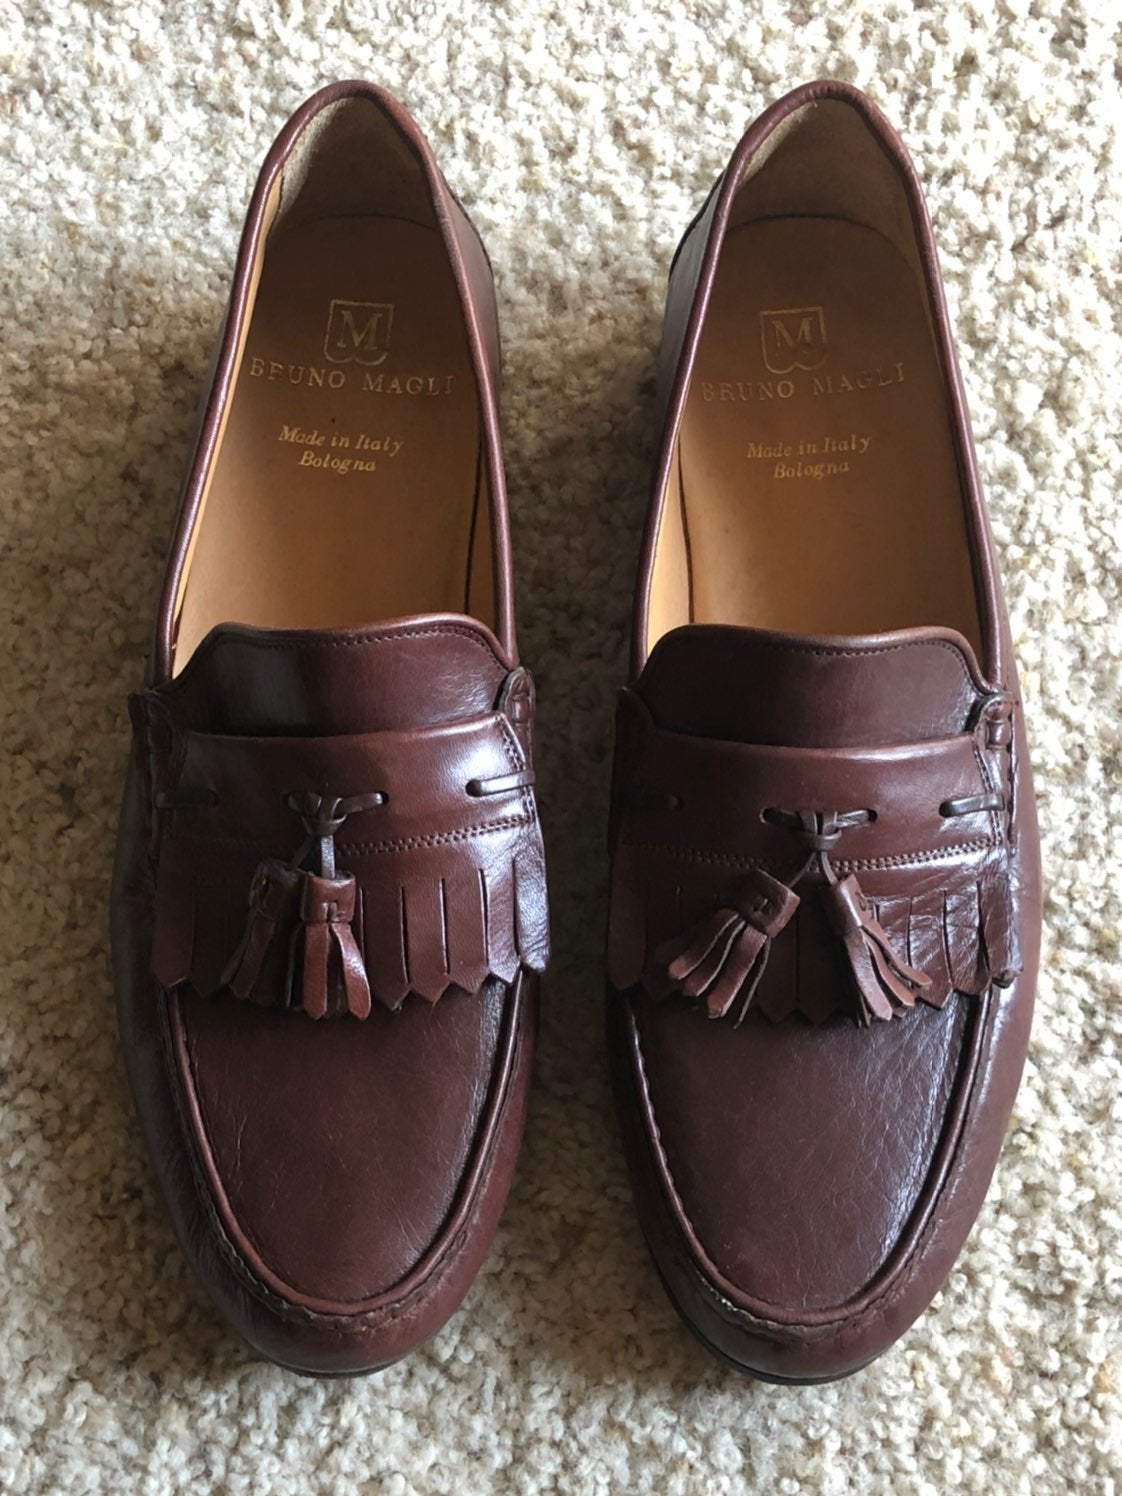 Bruno Magli brown loafers 11 1/2